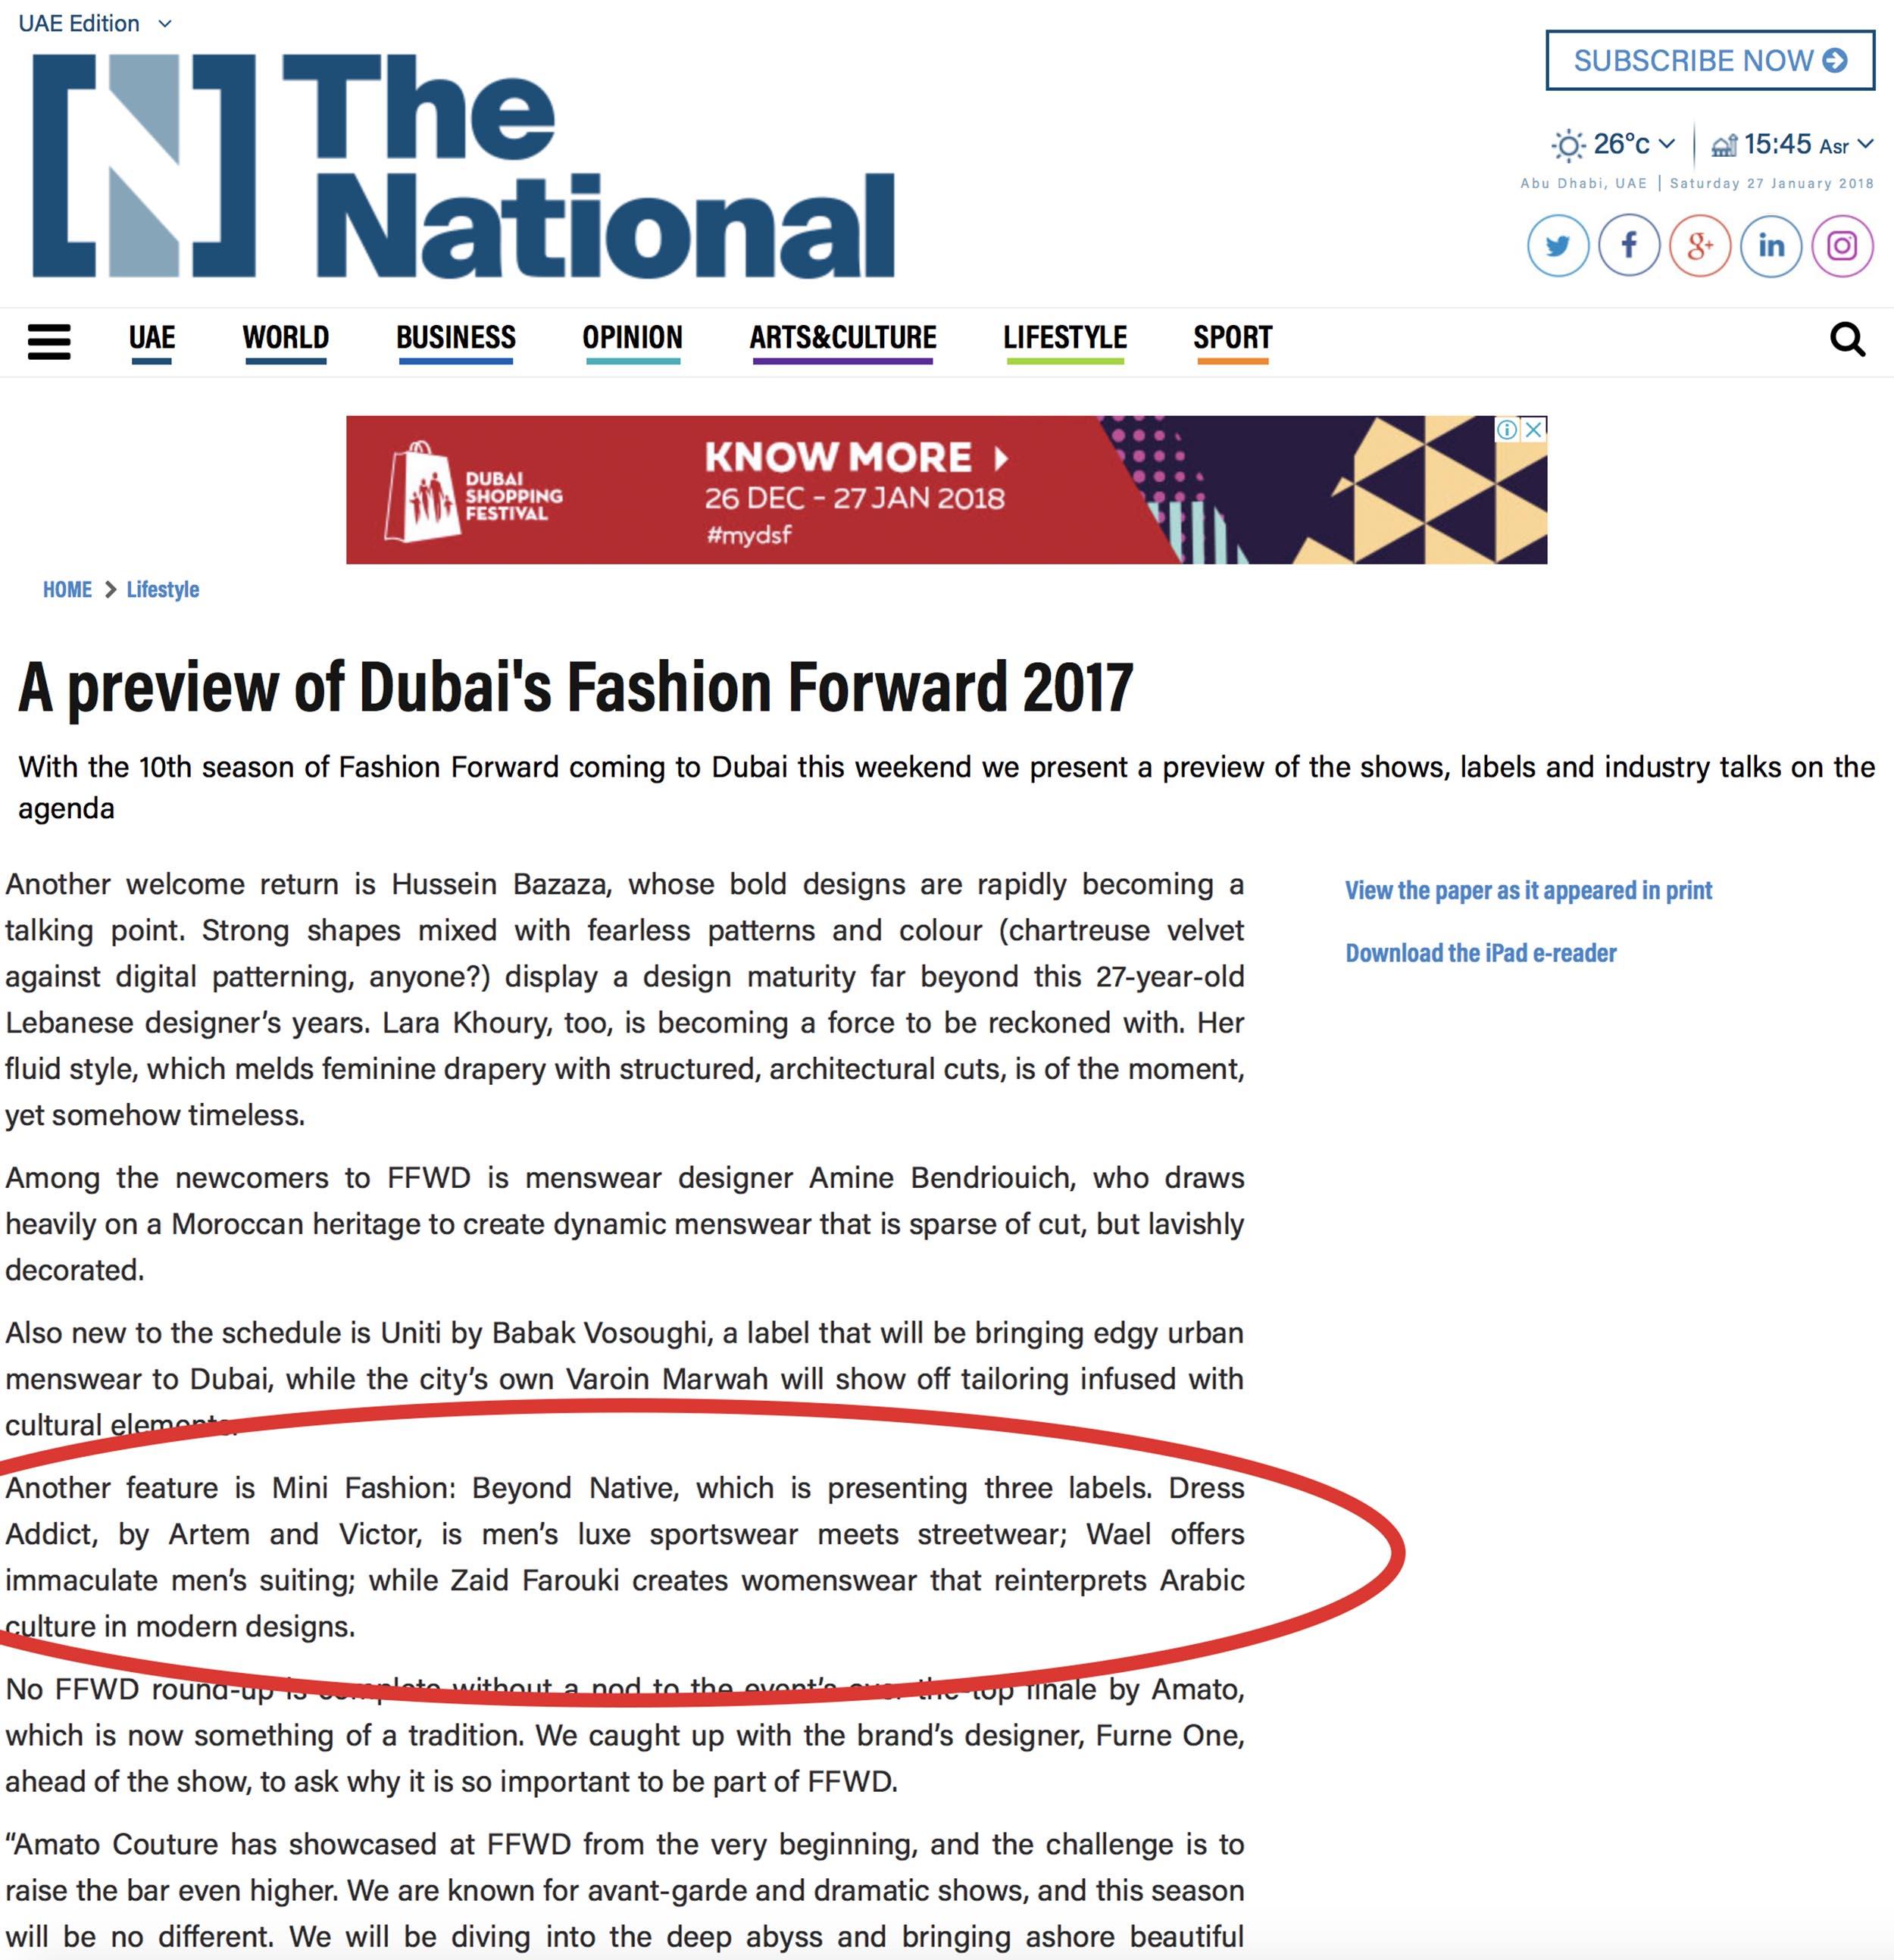 The National / November 2017